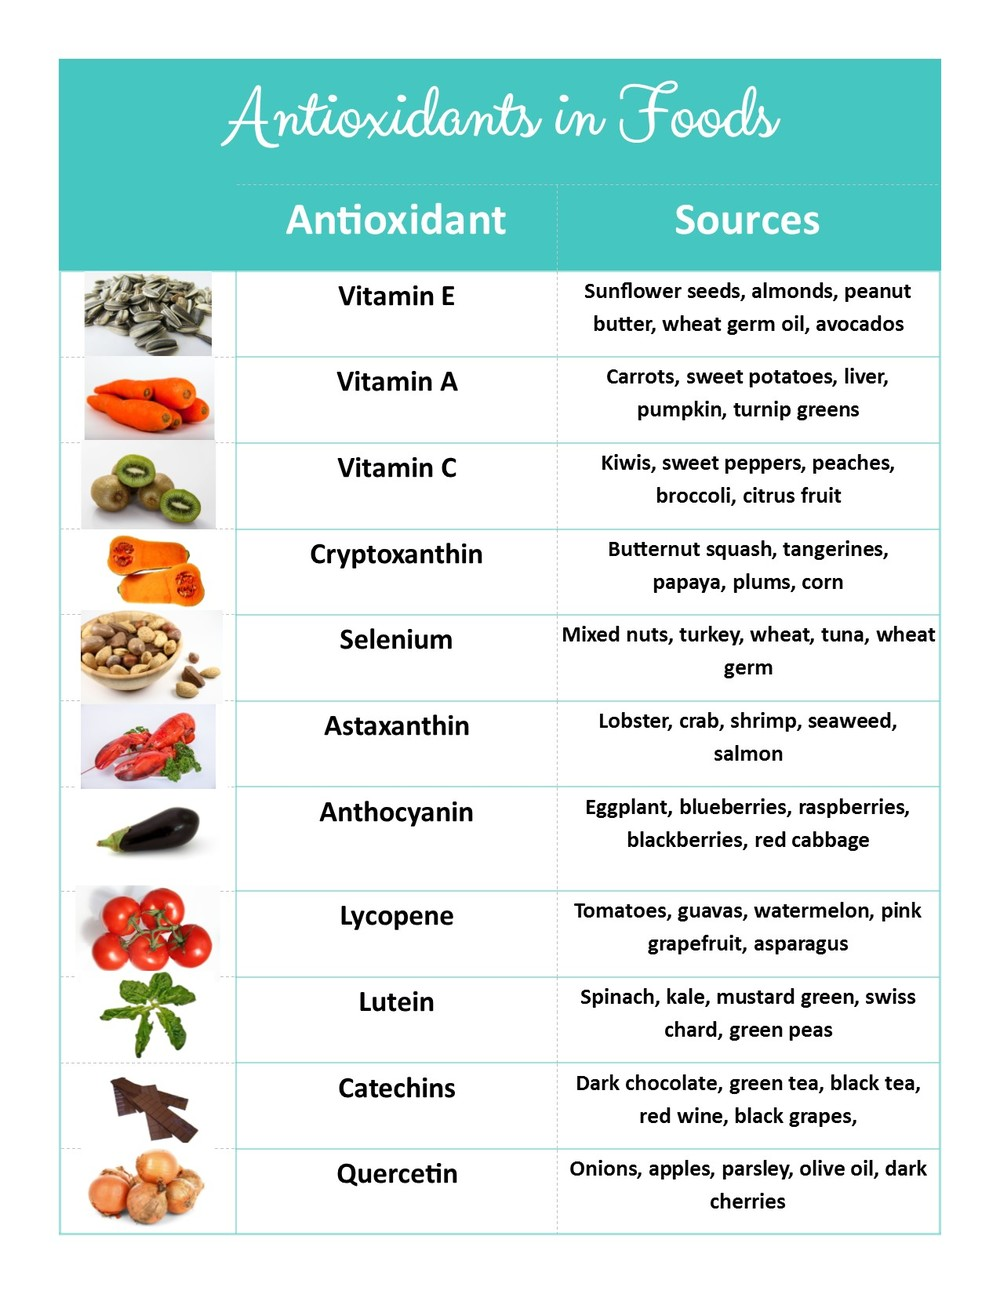 Sources of Antioxidants Vitamin E Vitamin A Vitamin C Cryptoxanthin Selenium Astaxanthin Anthocyanin Lycopene Letuein Catechins Quercetin